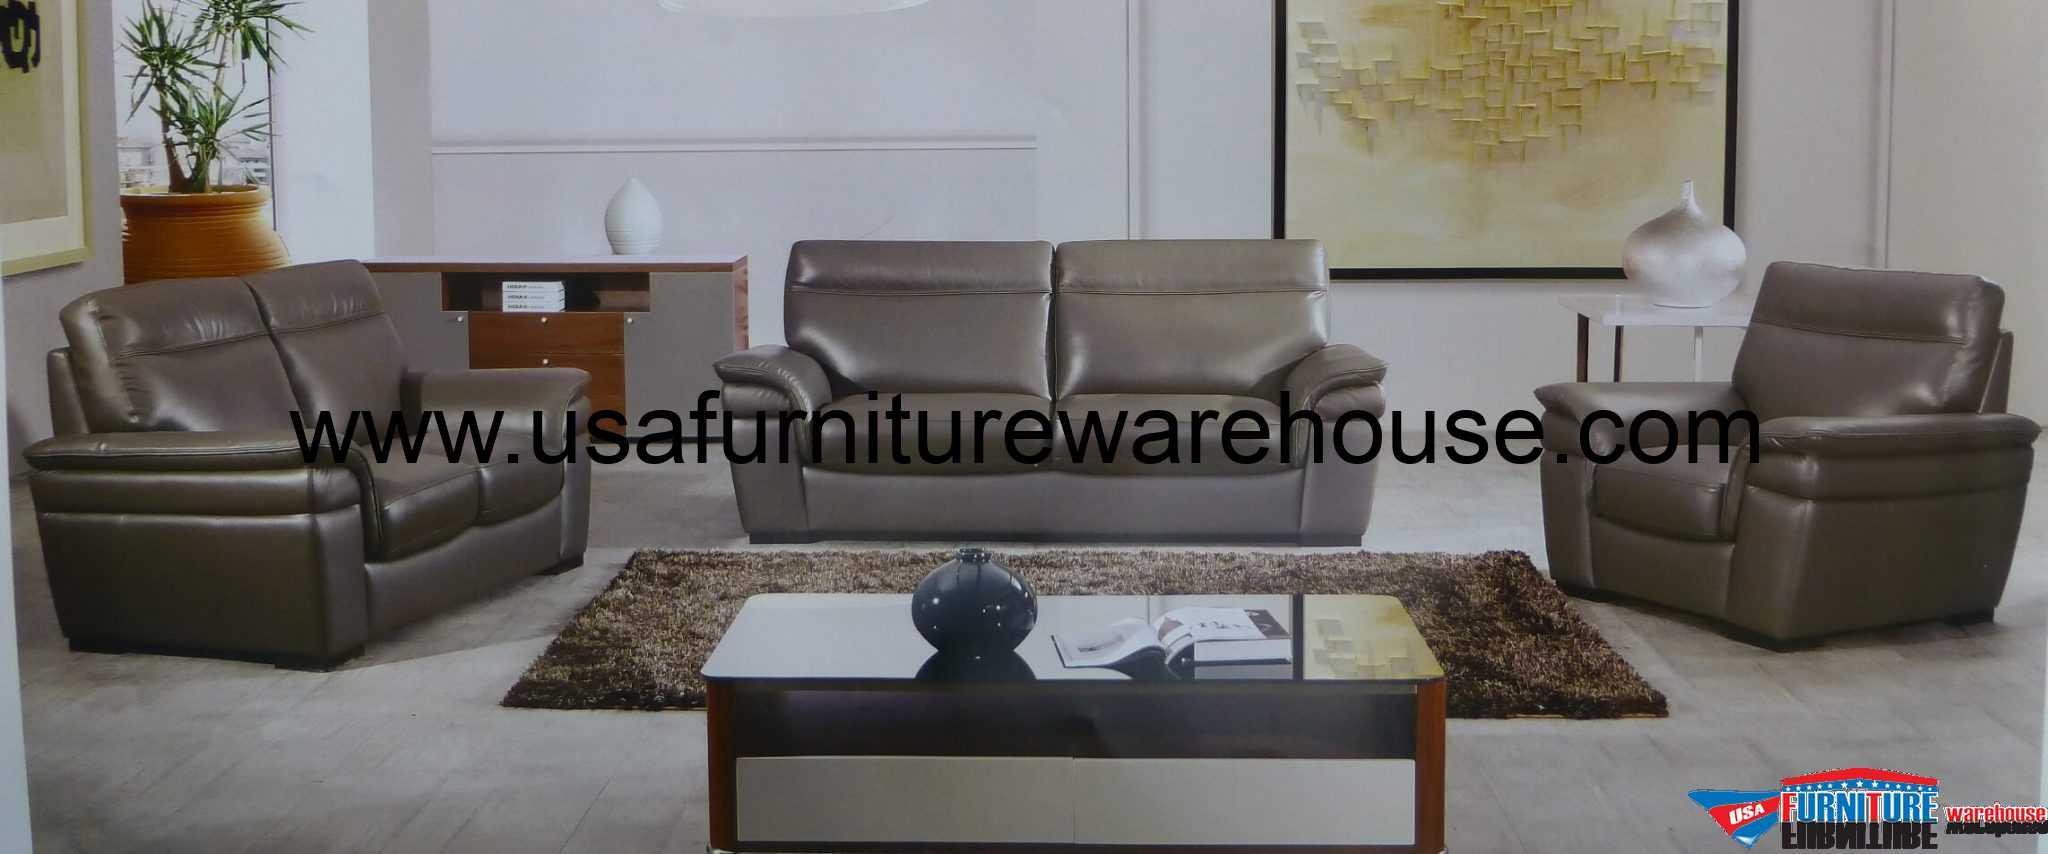 Plaza 3 Piece Italian Top-Grain Taupe Leather Sofa Set